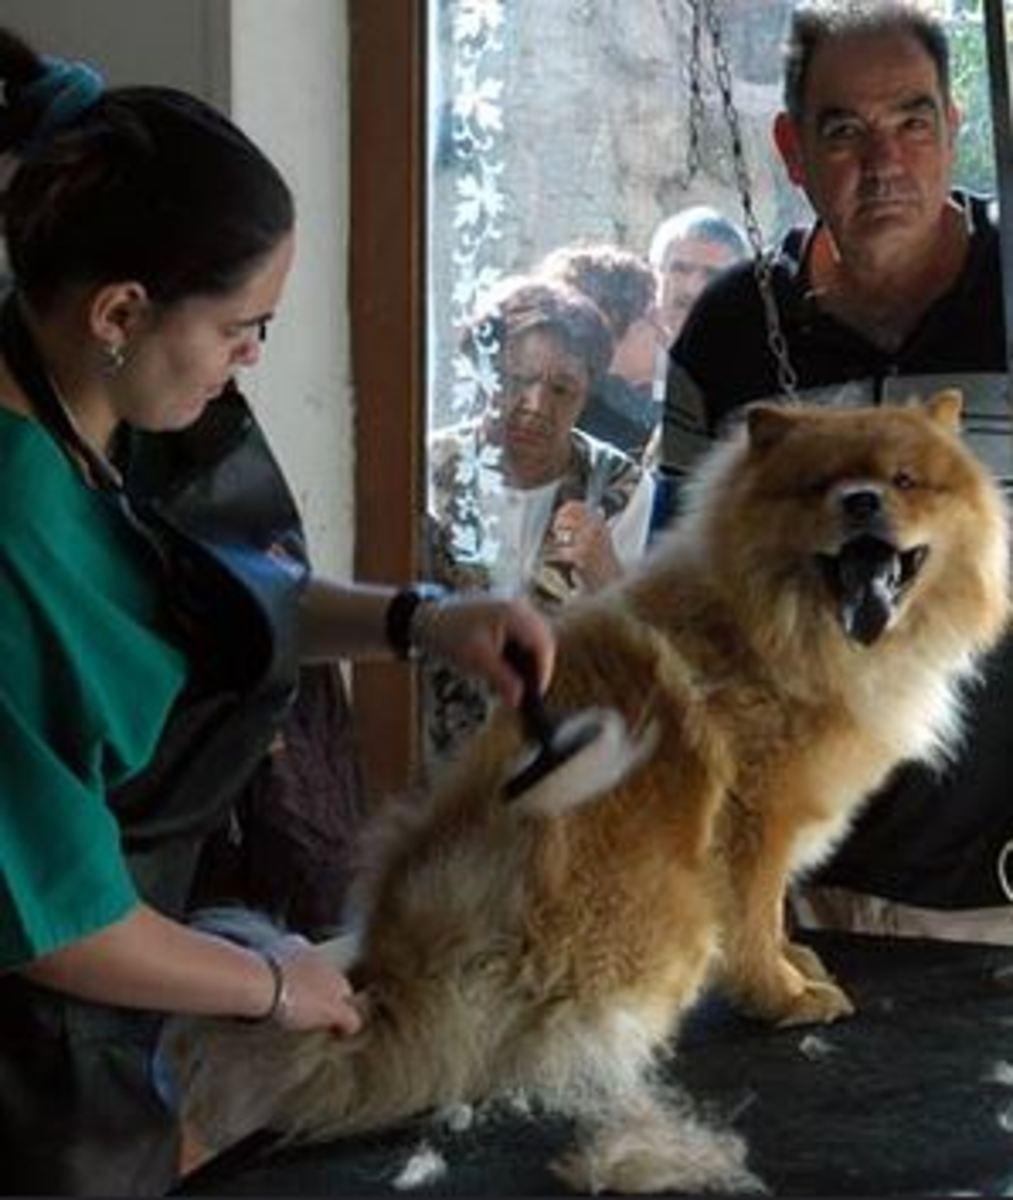 dog-stressed-at-dog-groomer